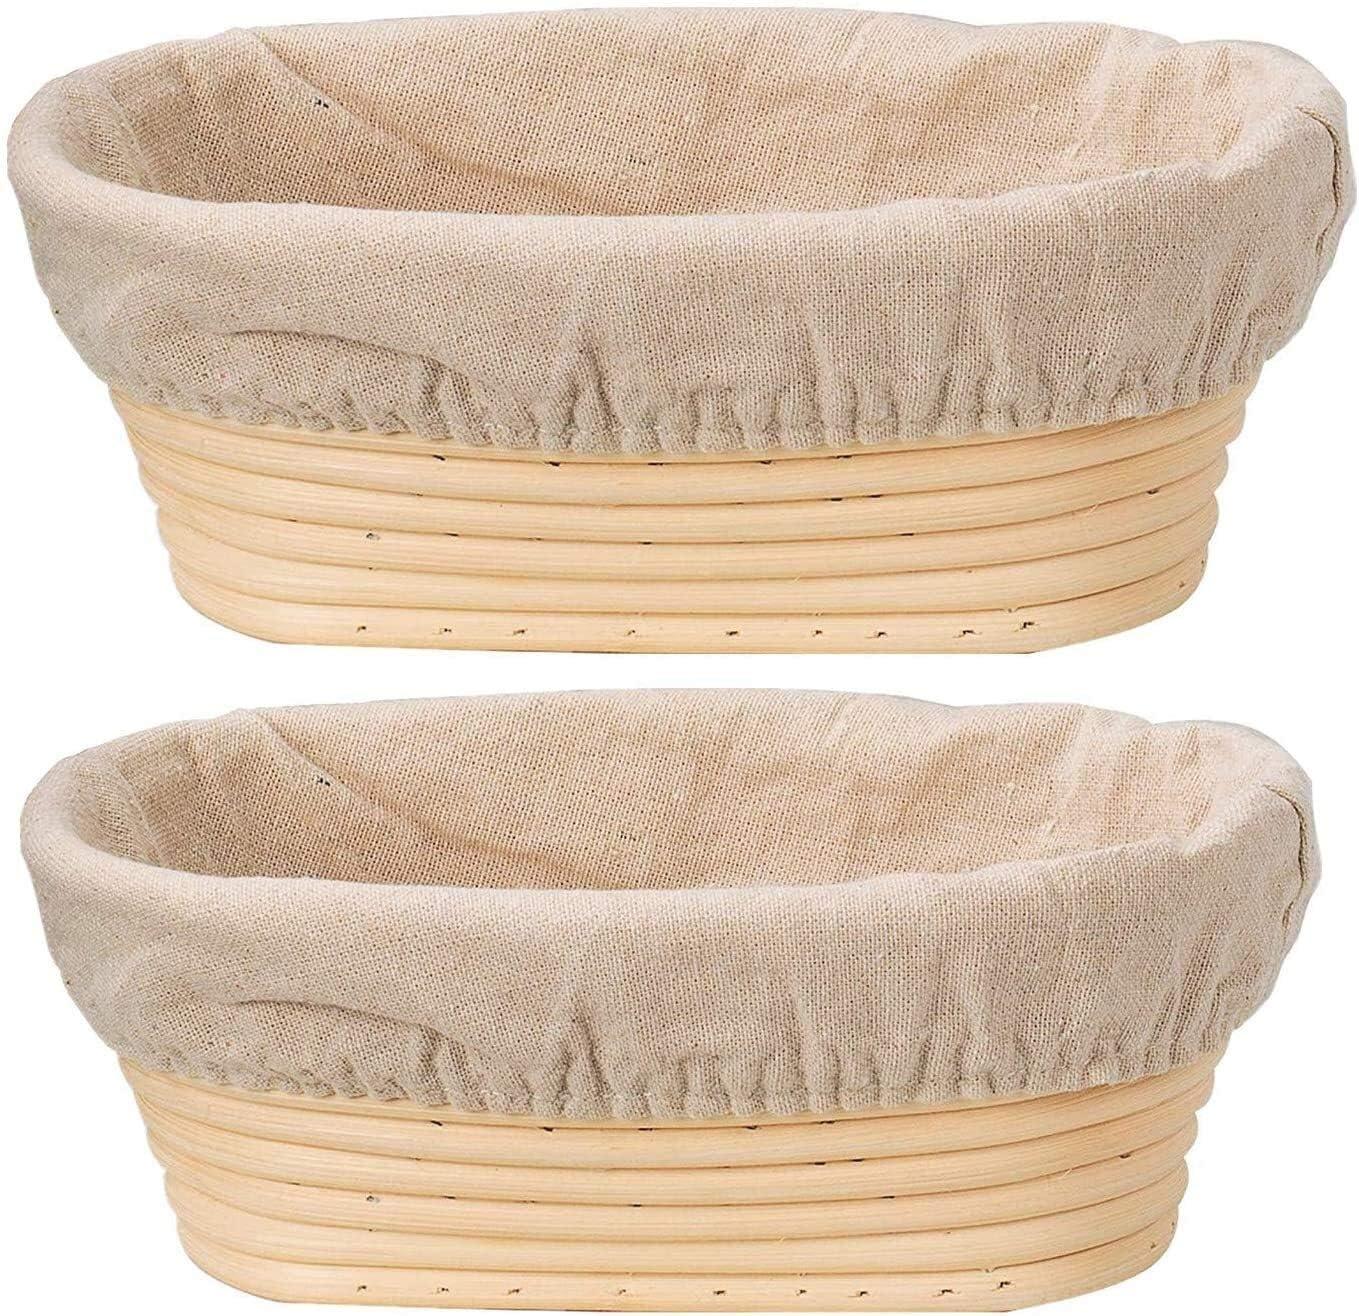 Hailiang Bread Ranking TOP19 Proofing Max 81% OFF Basket Dough Rising Bas Rattan